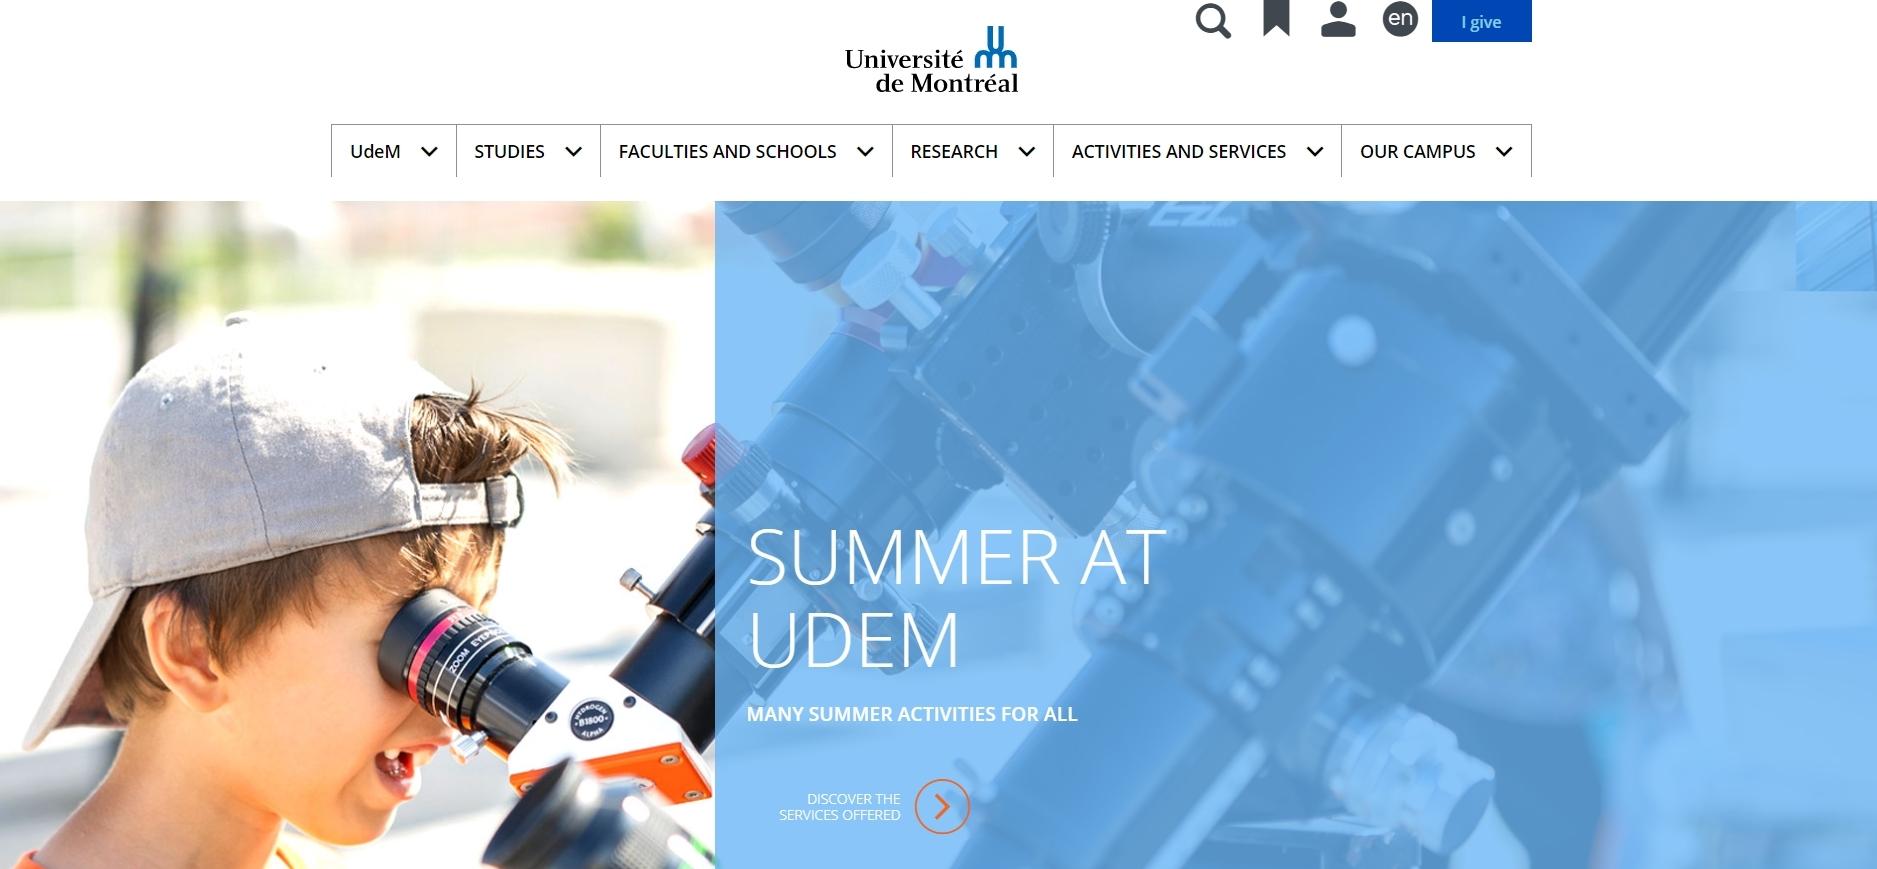 University of Montreal - Computer Science Universities In Canada